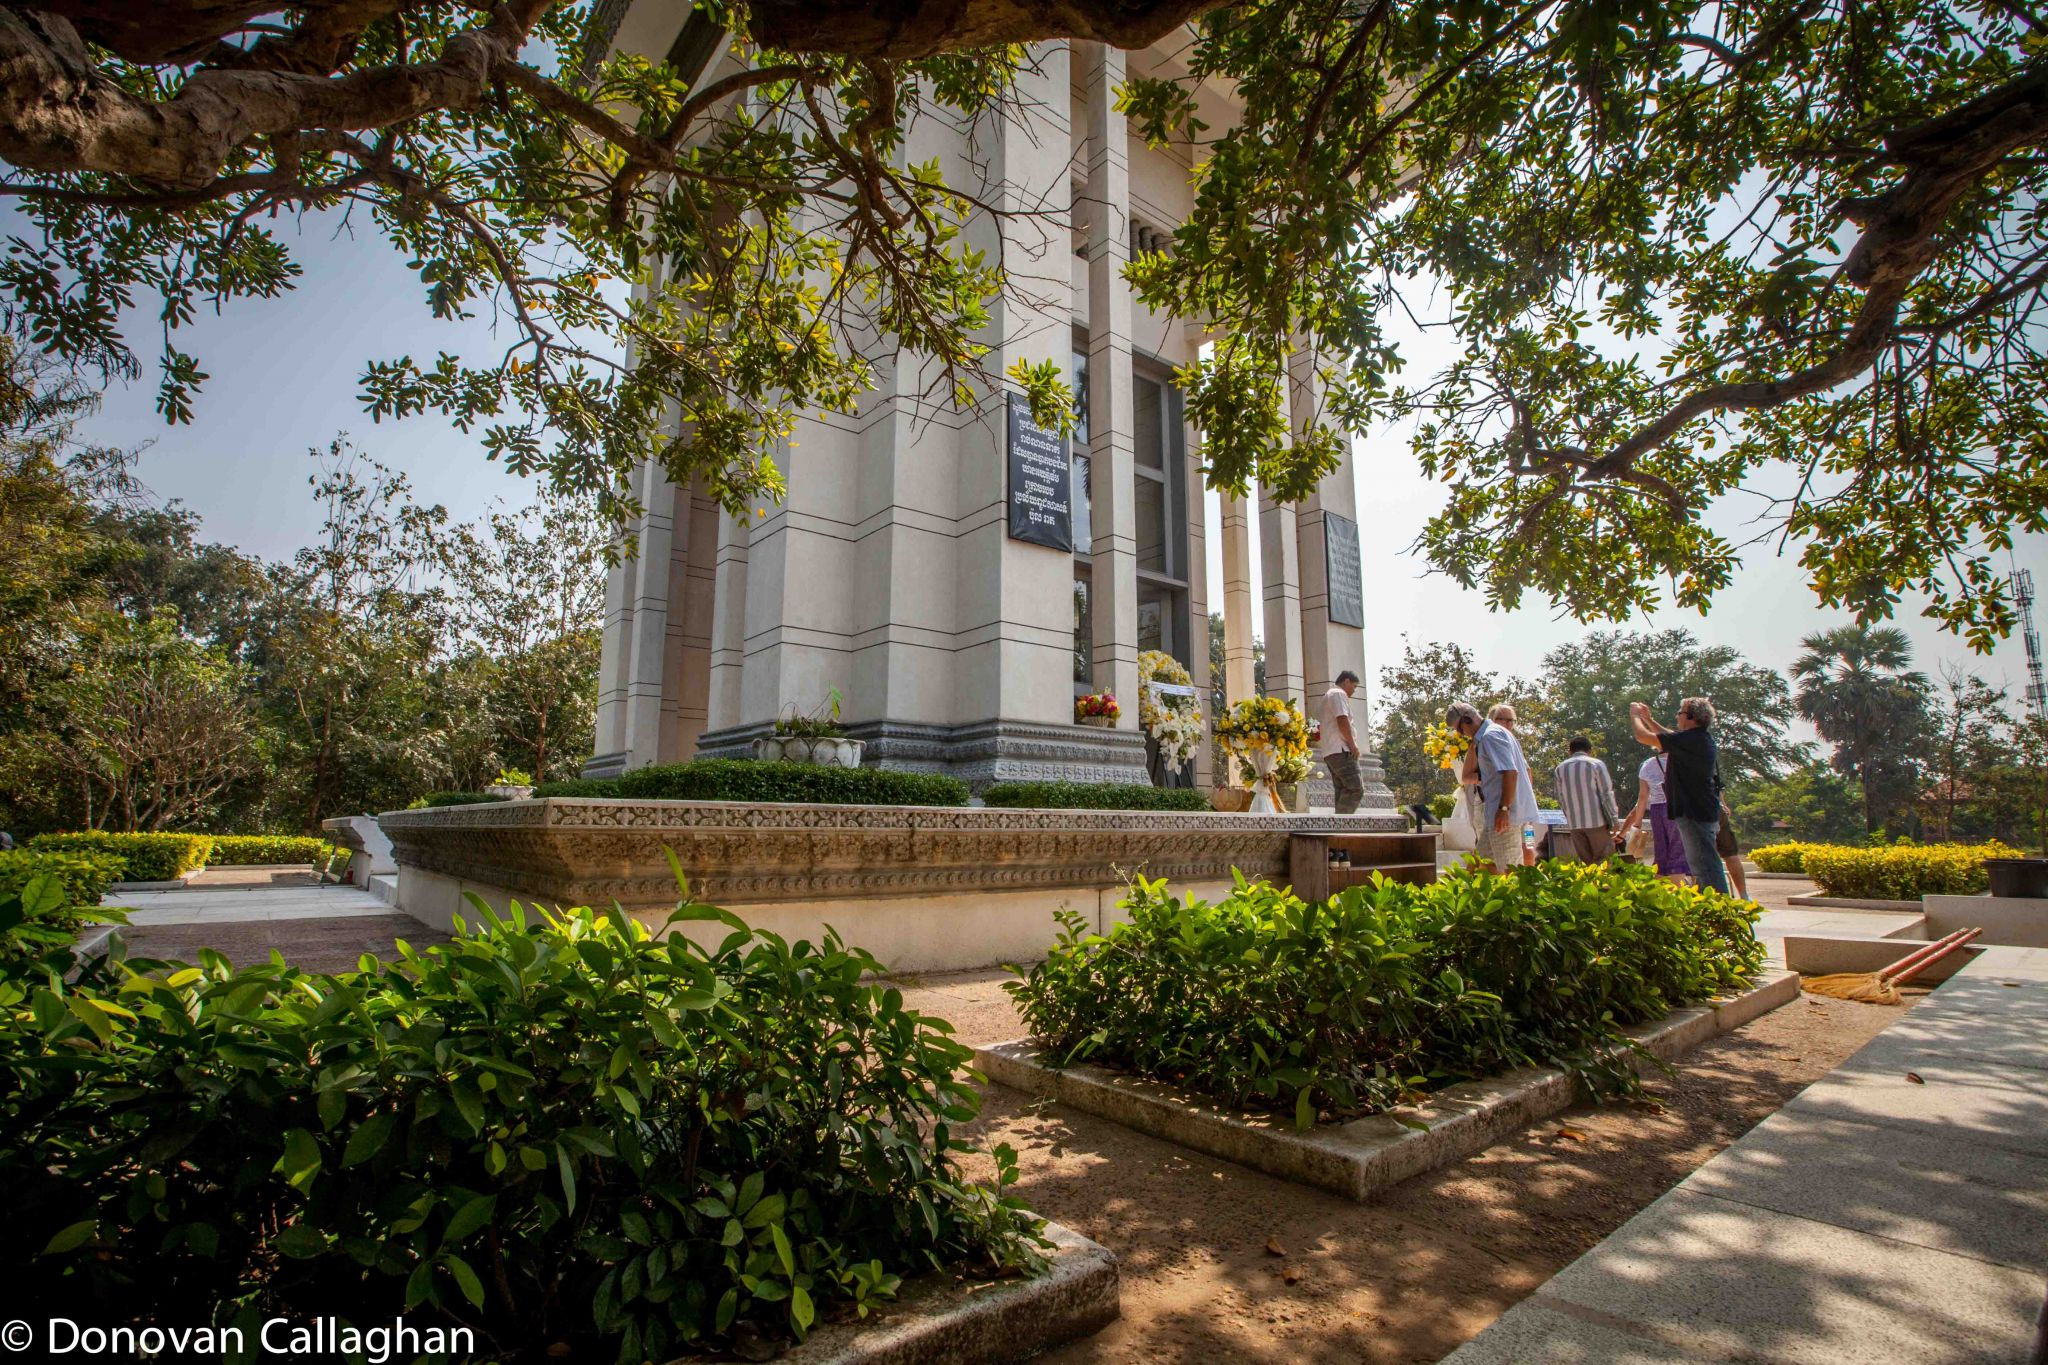 The monuement to the Killing Fields Phnom Penh, Cambodia